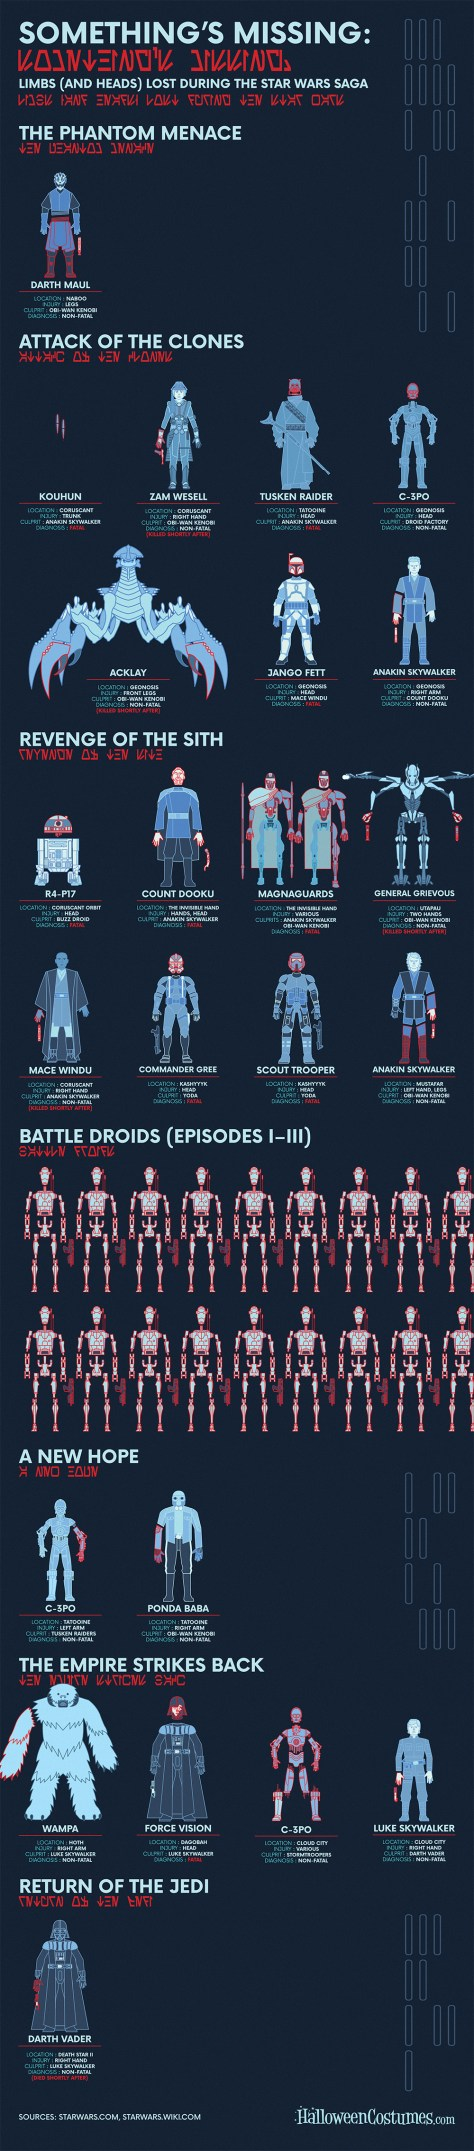 Star Wars Limb Loss Infographic